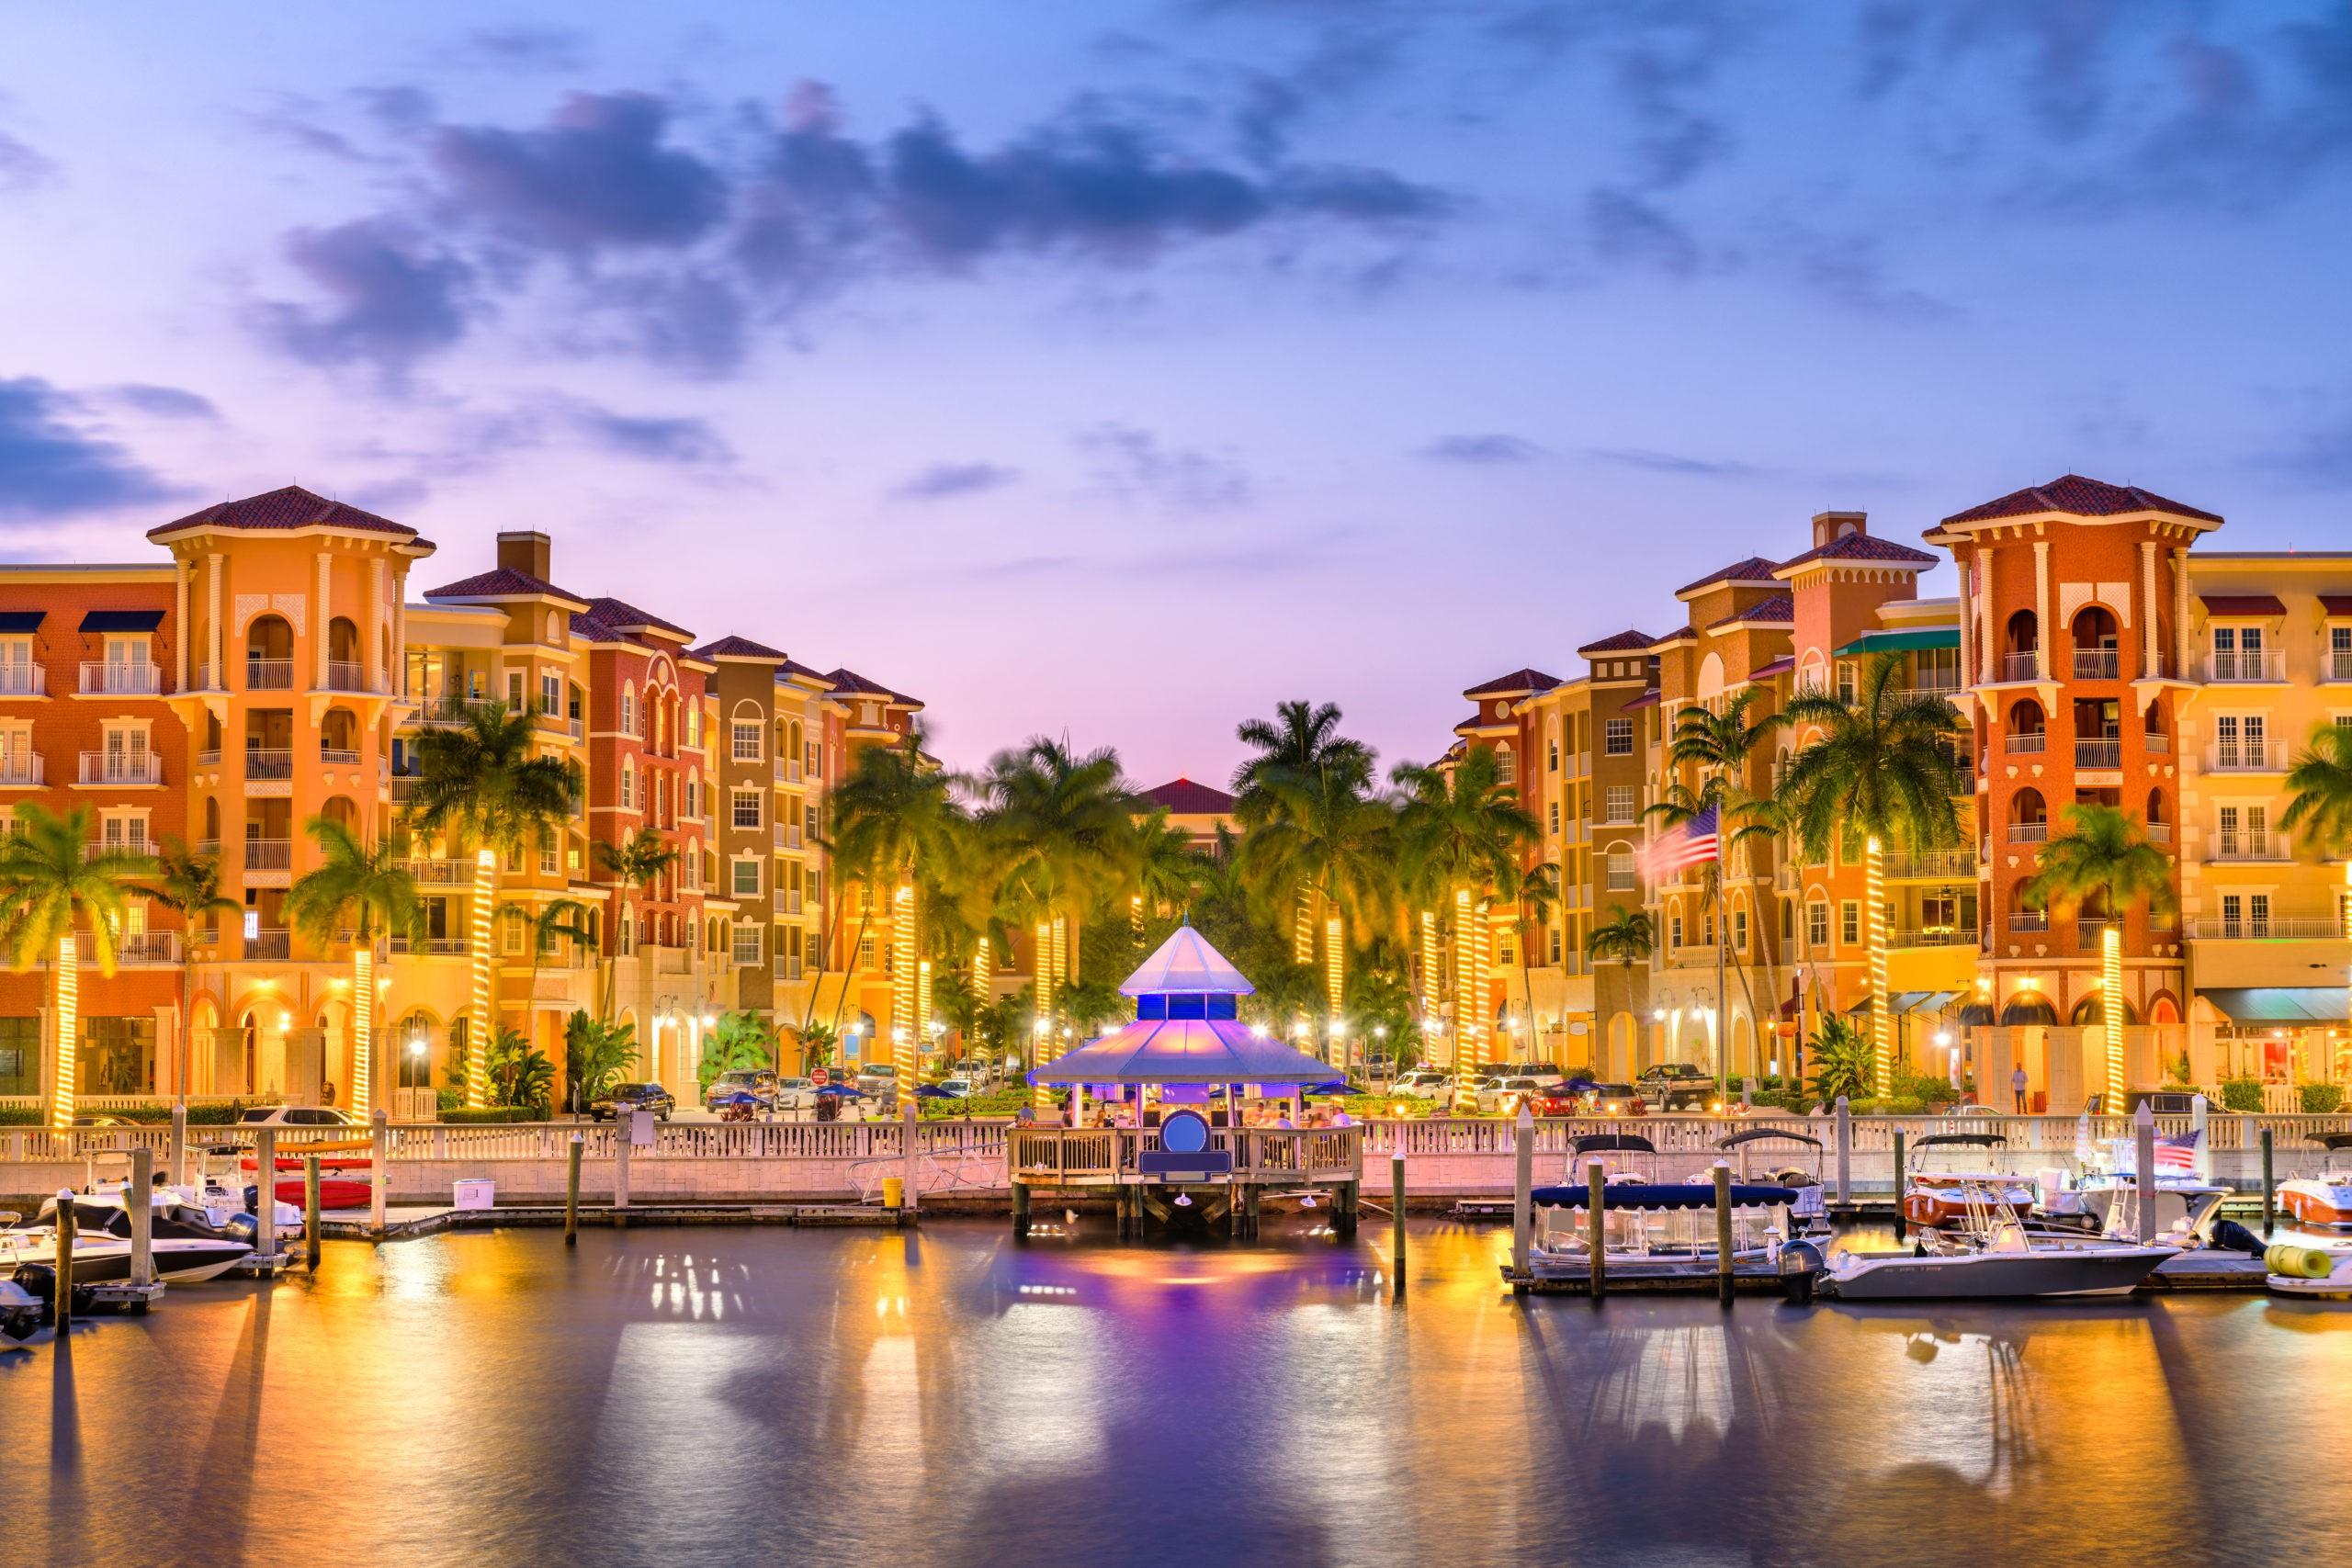 Naples, Floryda, licencja: shutterstock/By Sean Pavone